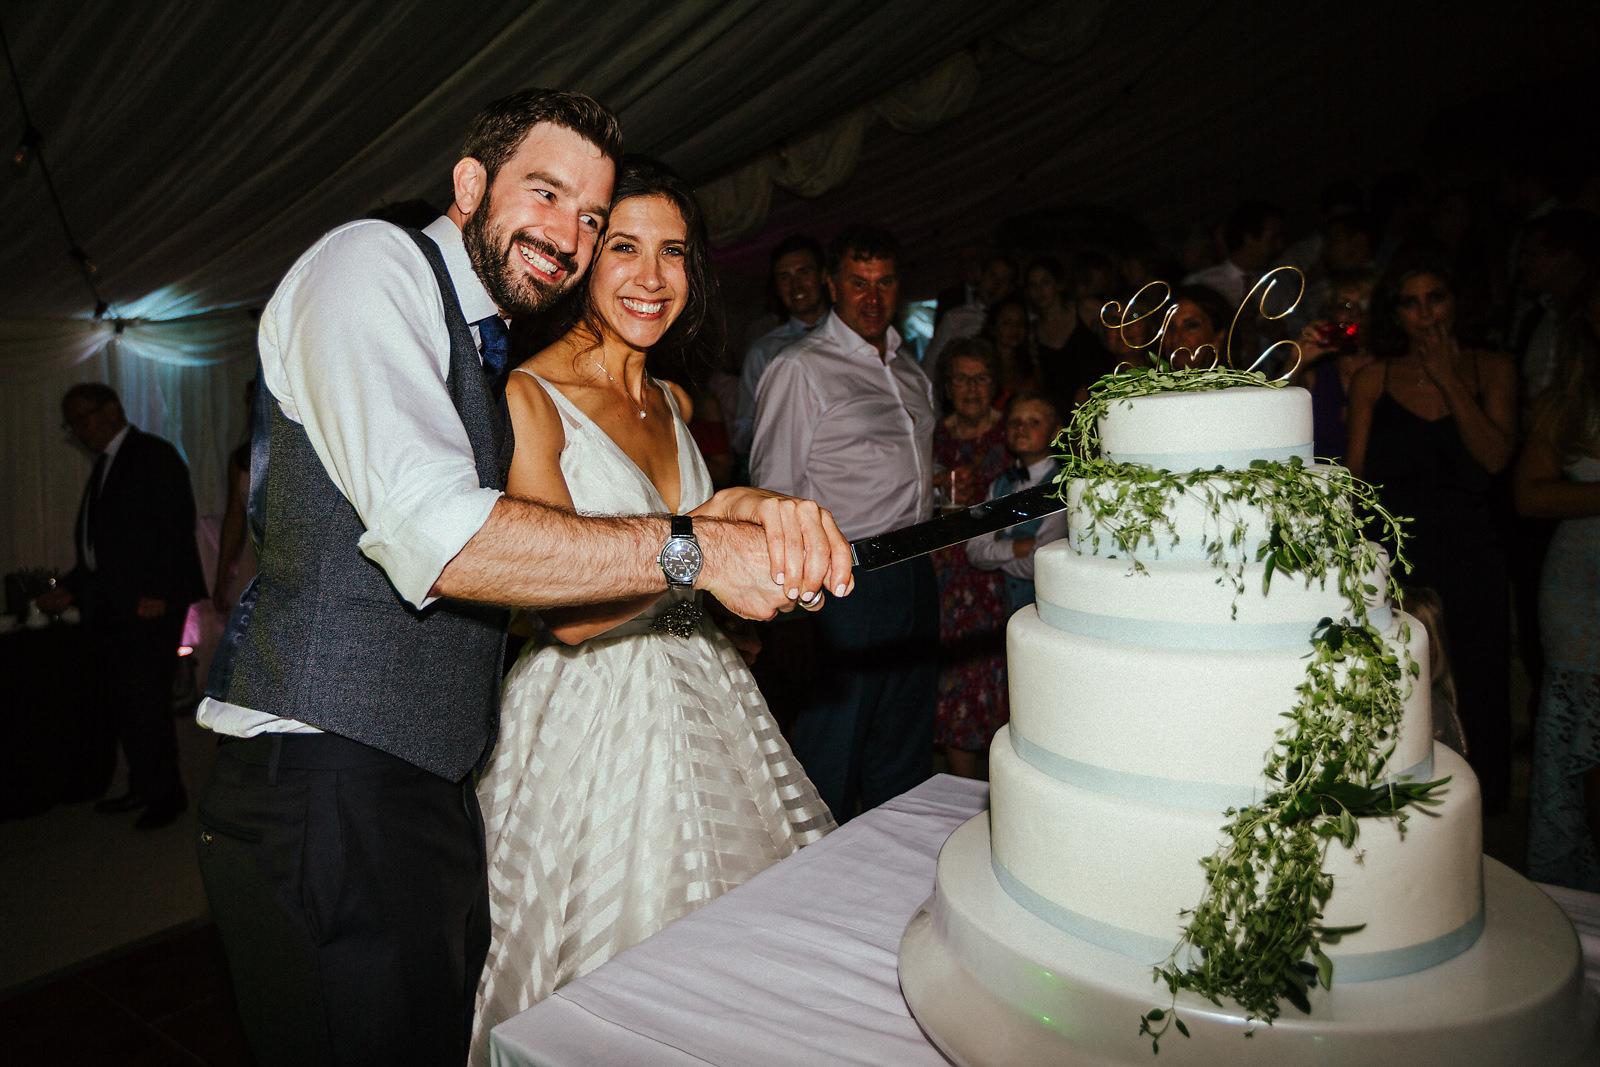 Cake cutting at Jewish wedding in Essex